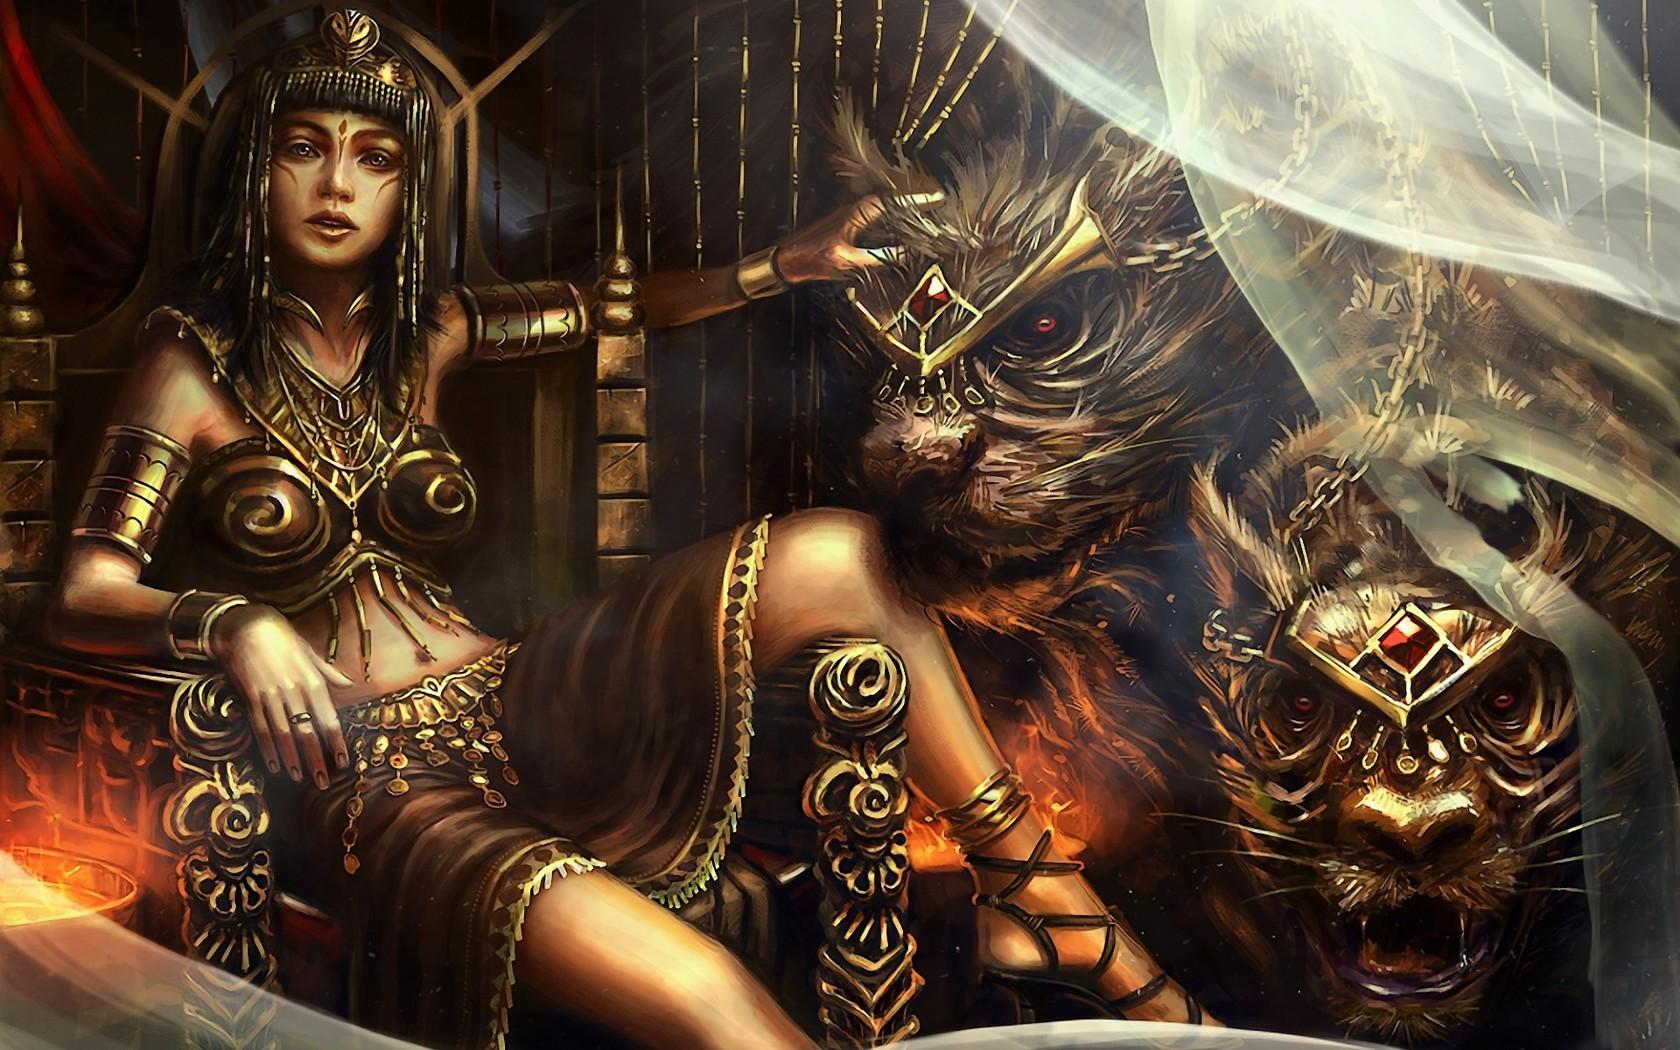 Egypt Warrior Illustration Anubis Pyramid Fantasy Art: Http://bpsola.cgsociety.org/gallery/944539/ Art